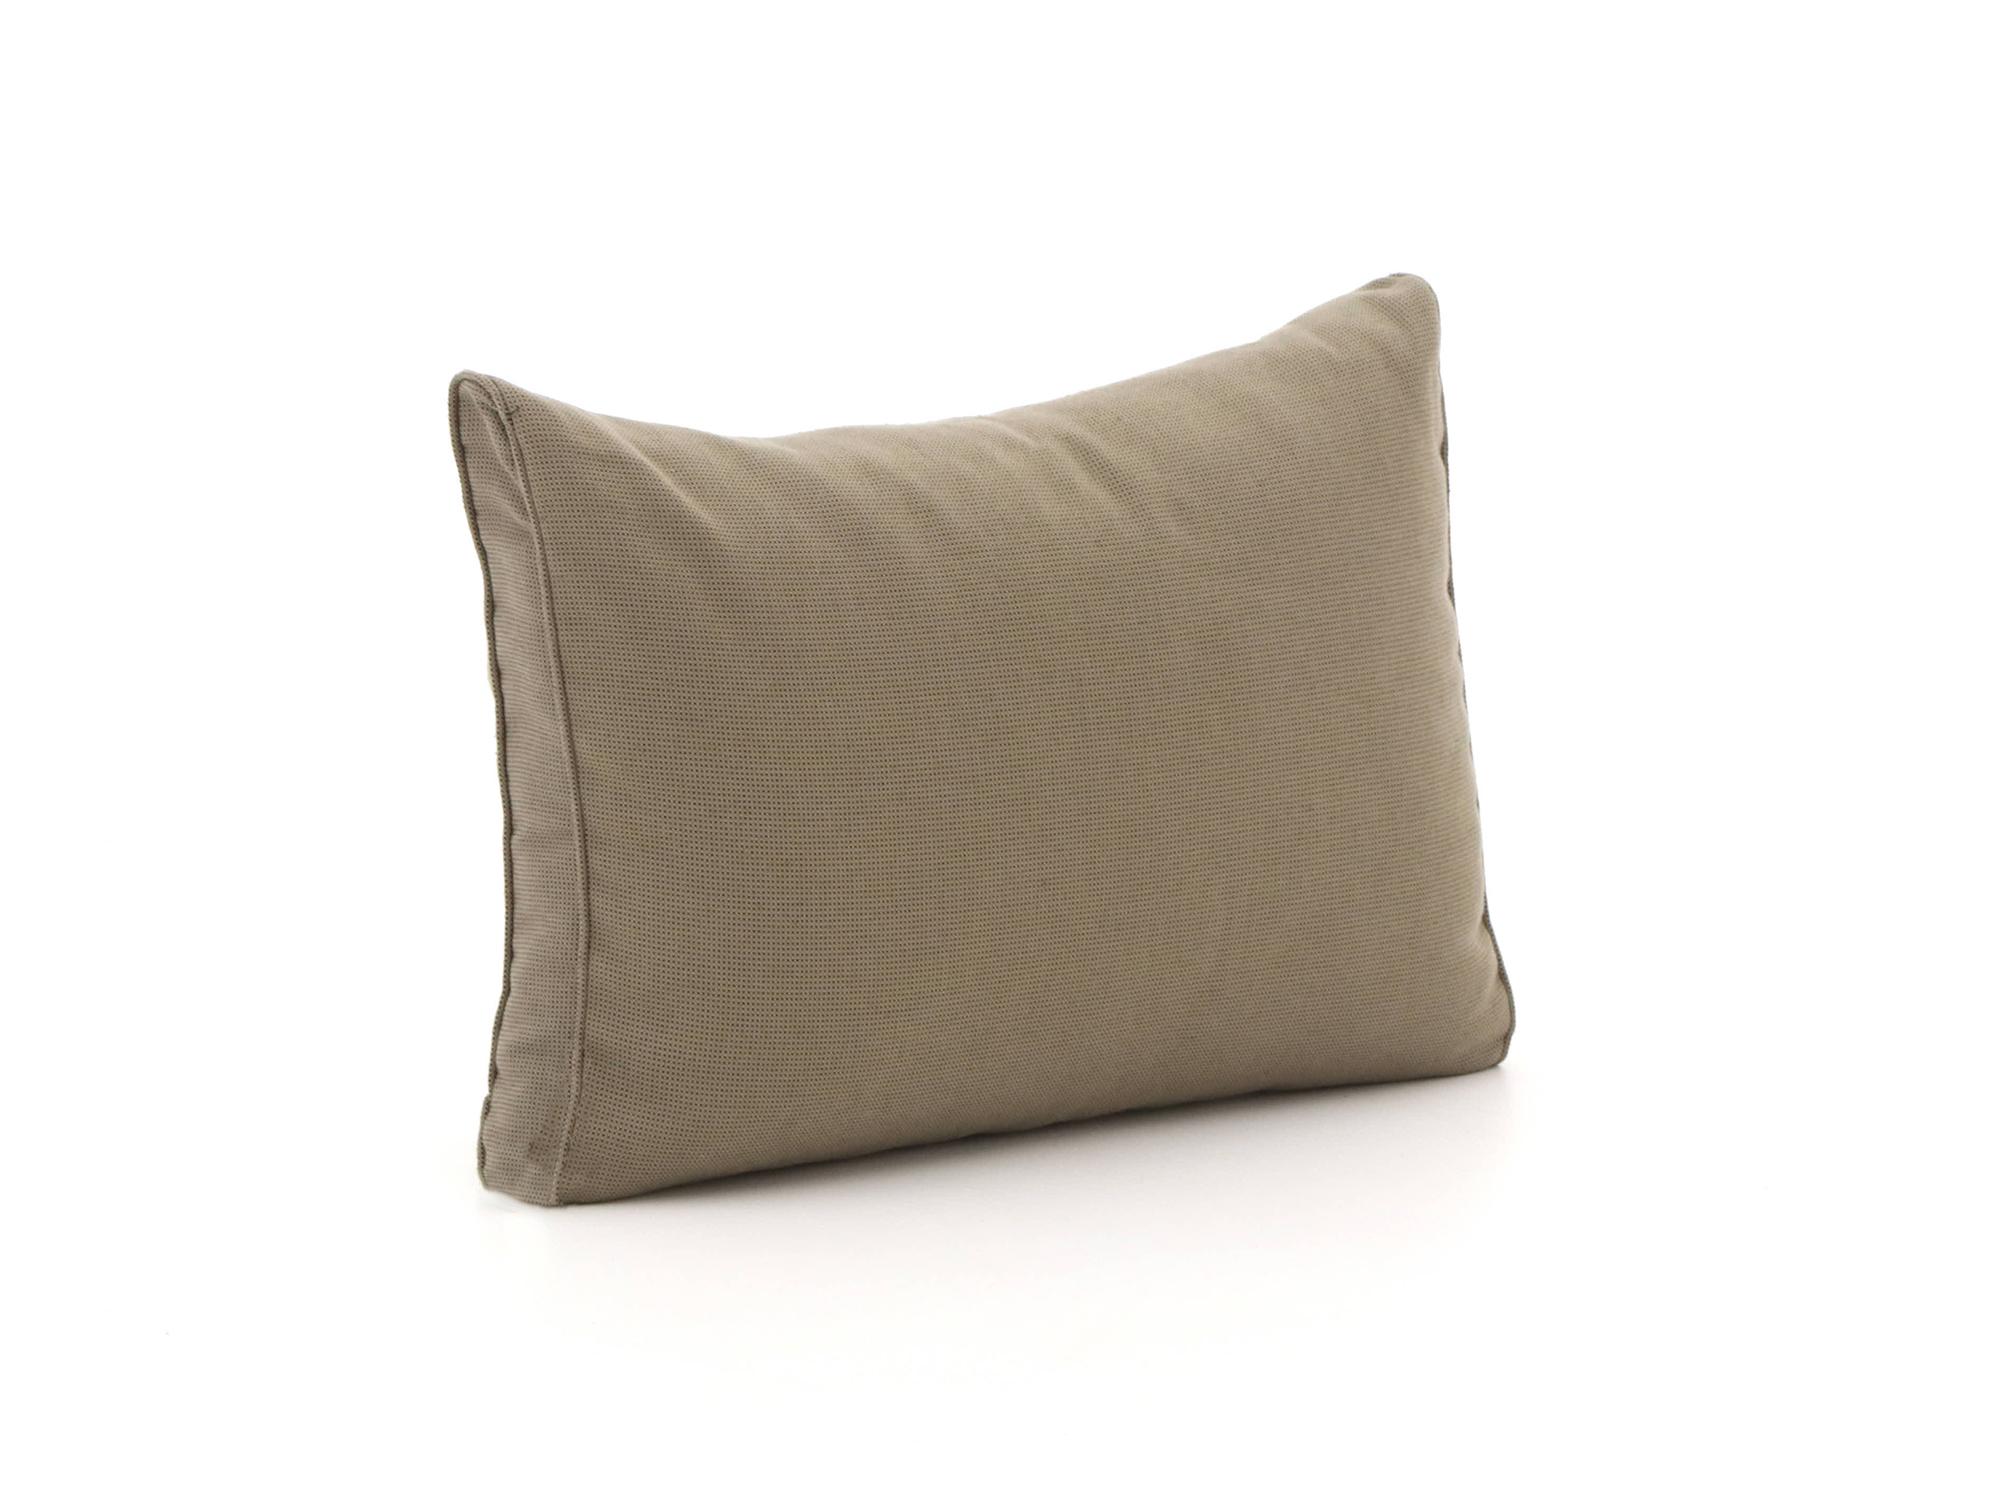 Madison loungekussen luxe rug 60x40cm